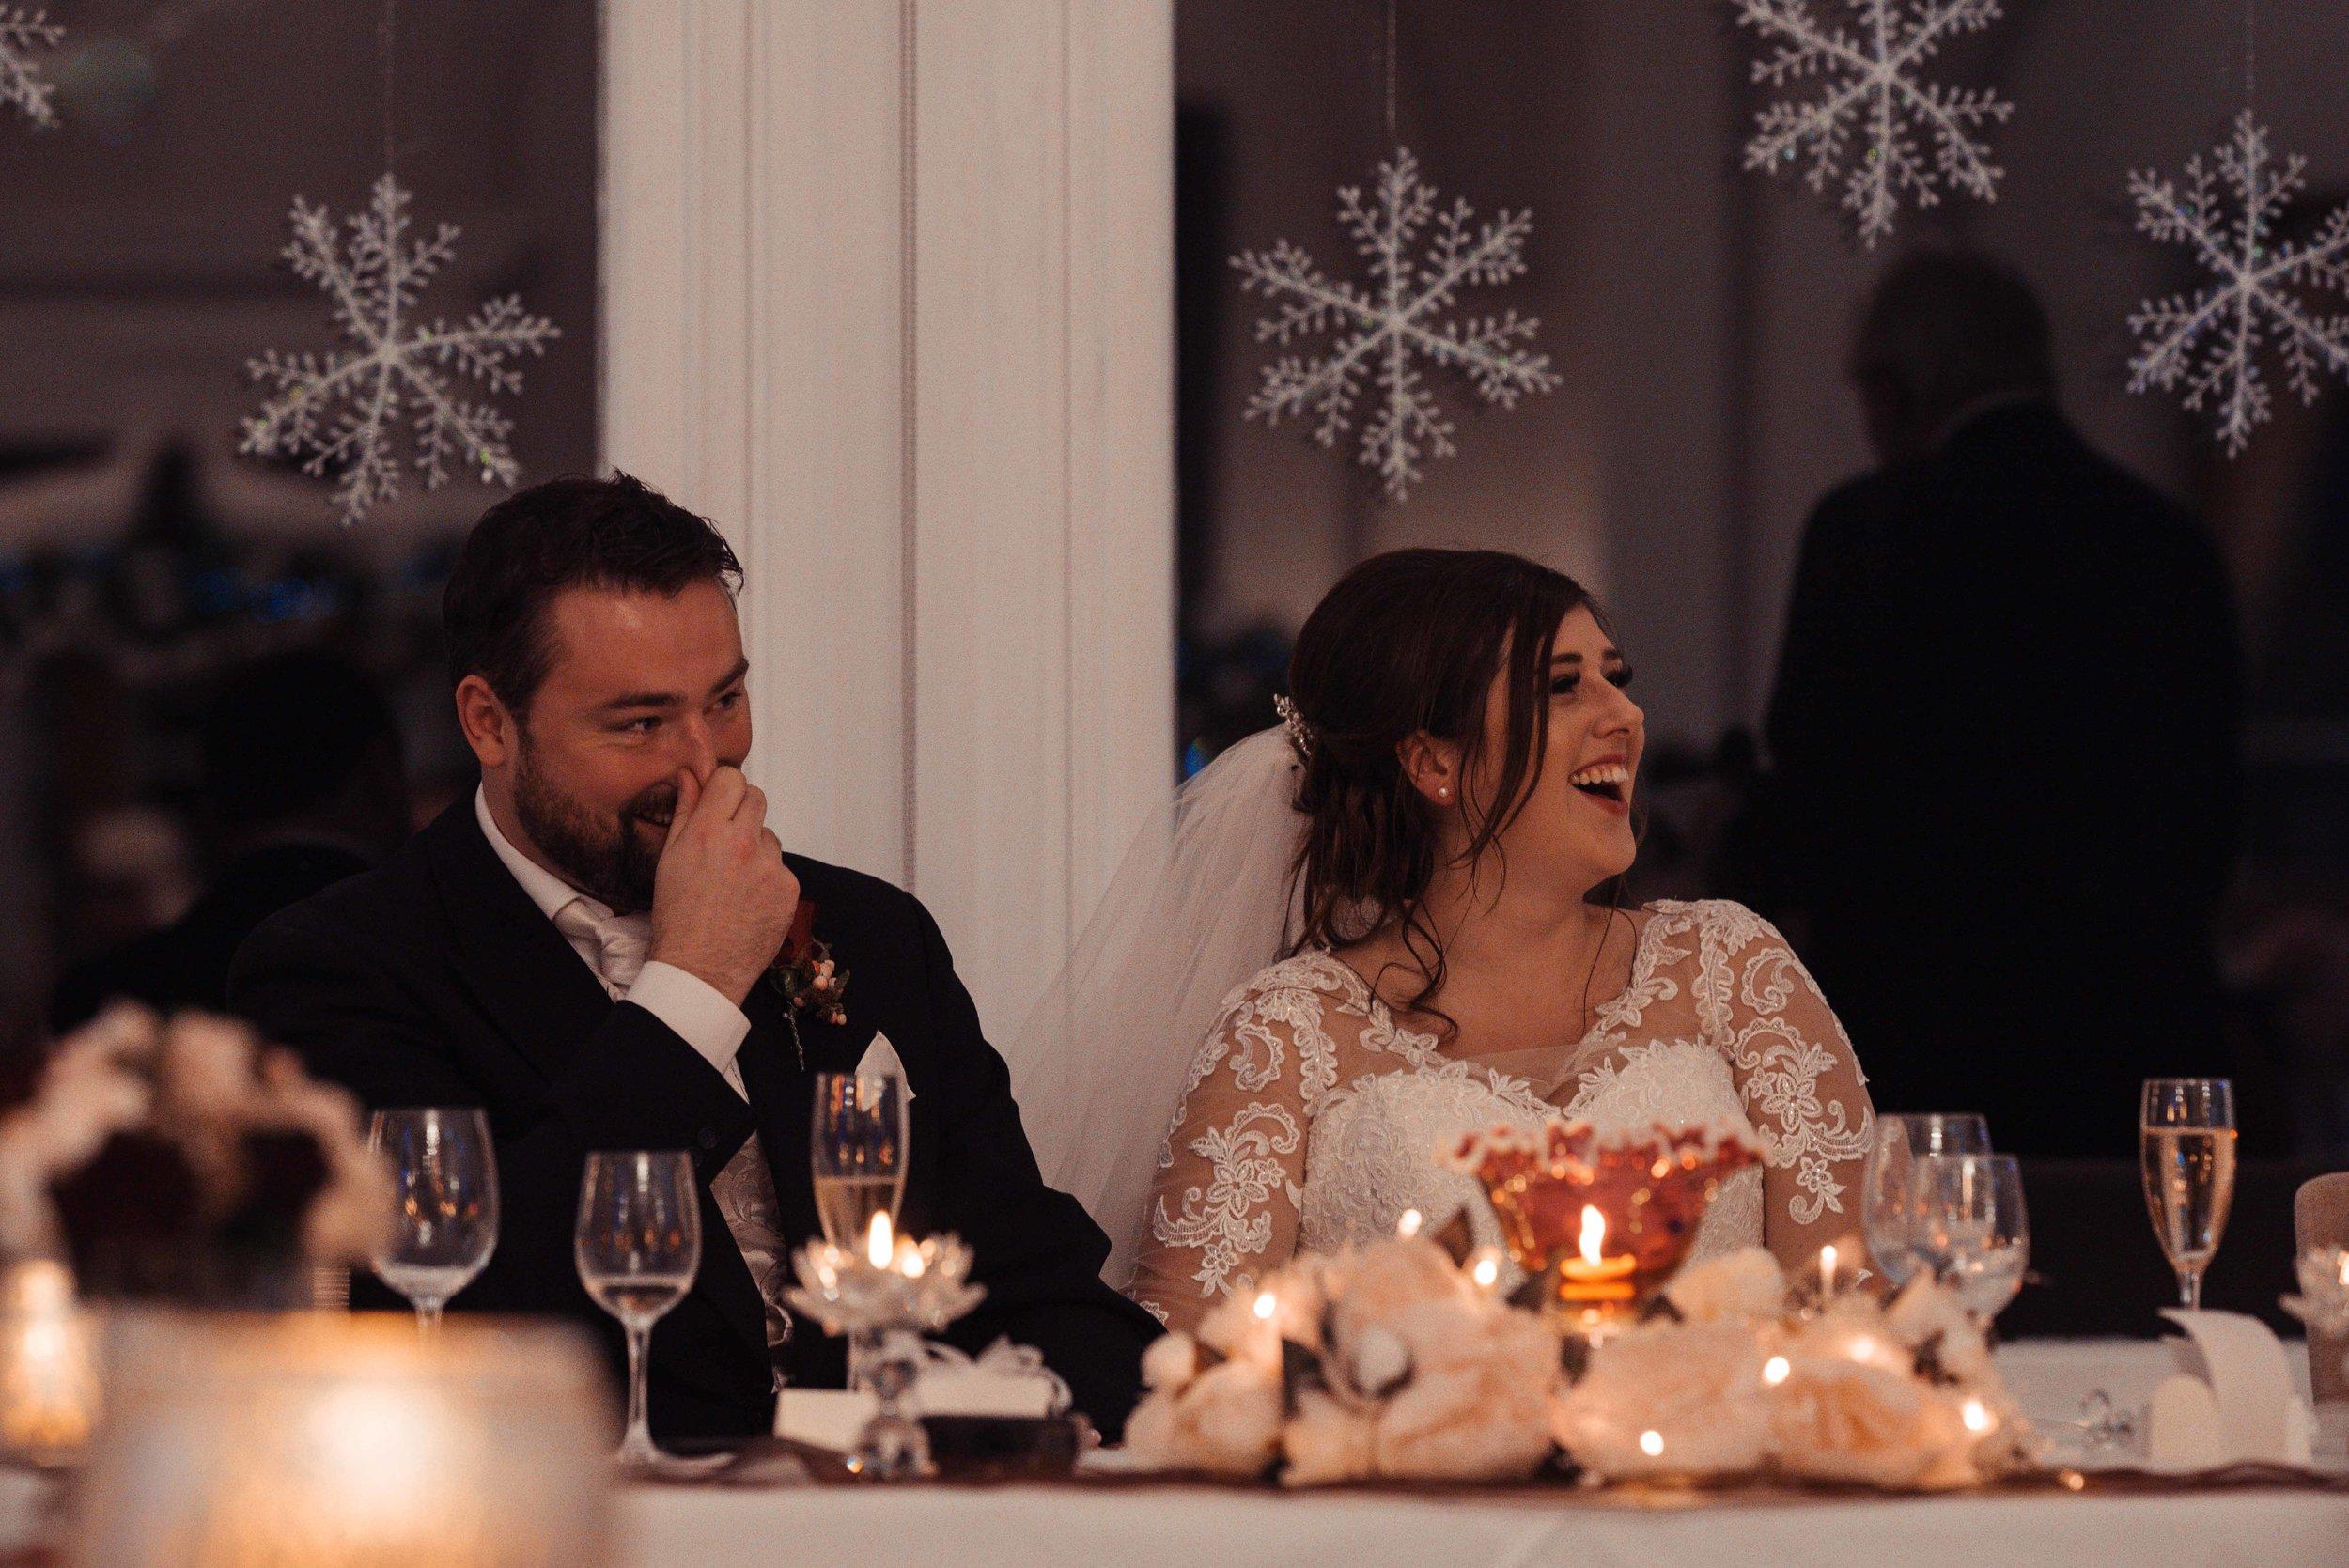 Belsfield-wedding-photography-36.jpg